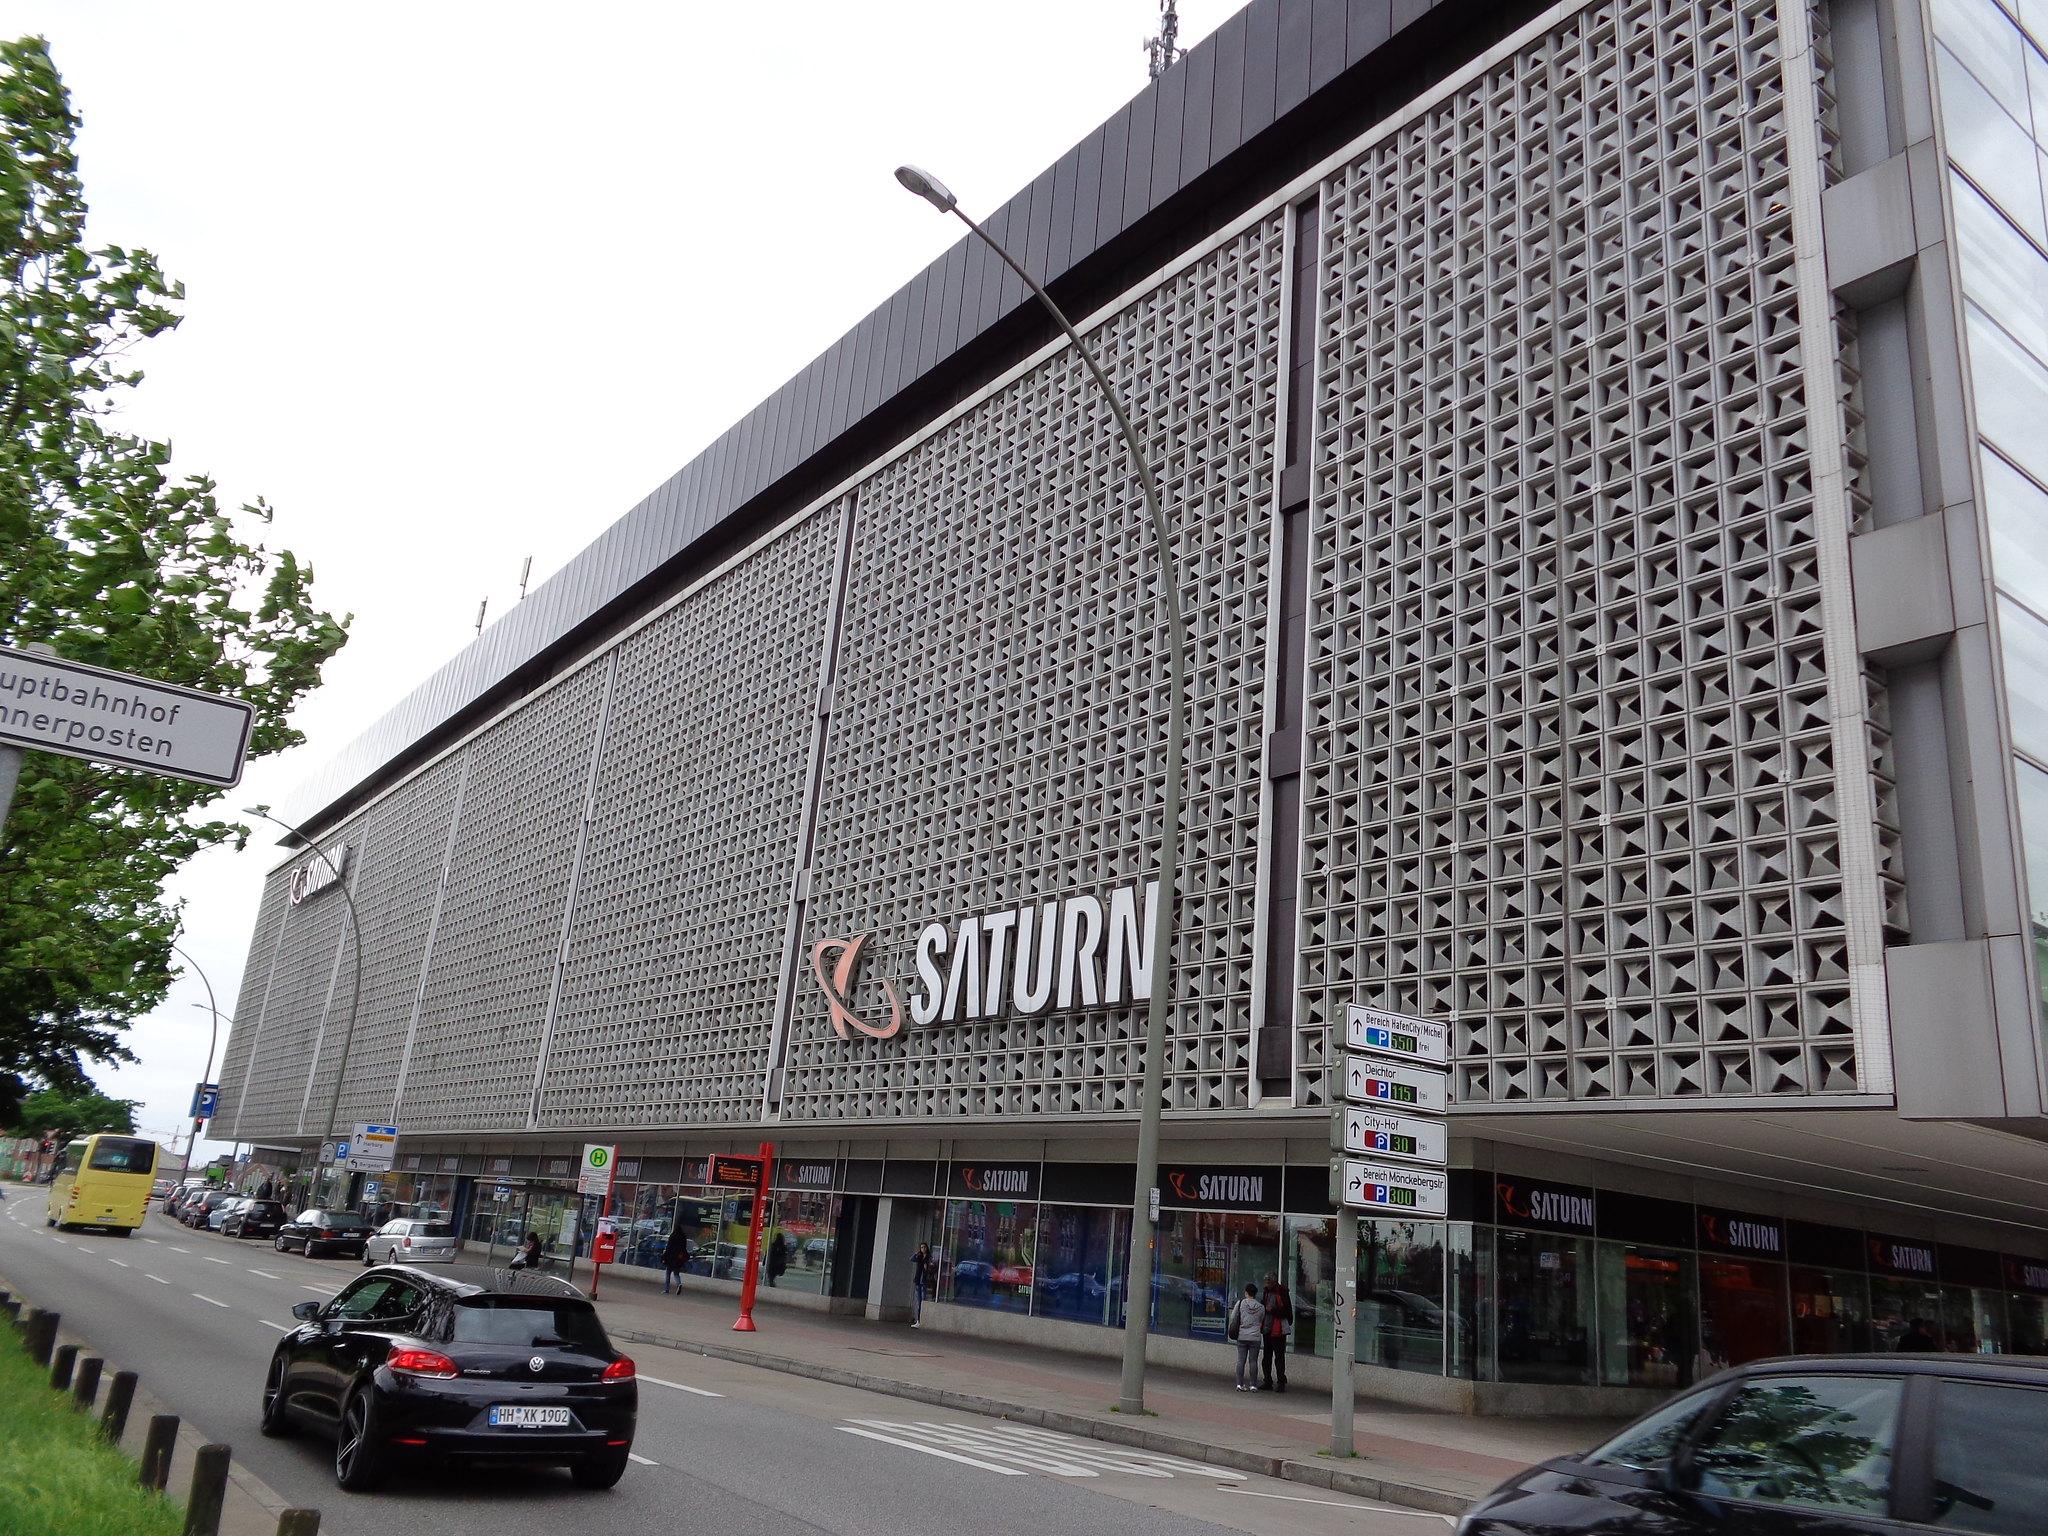 Saturn Hamburg Mönckebergstr.